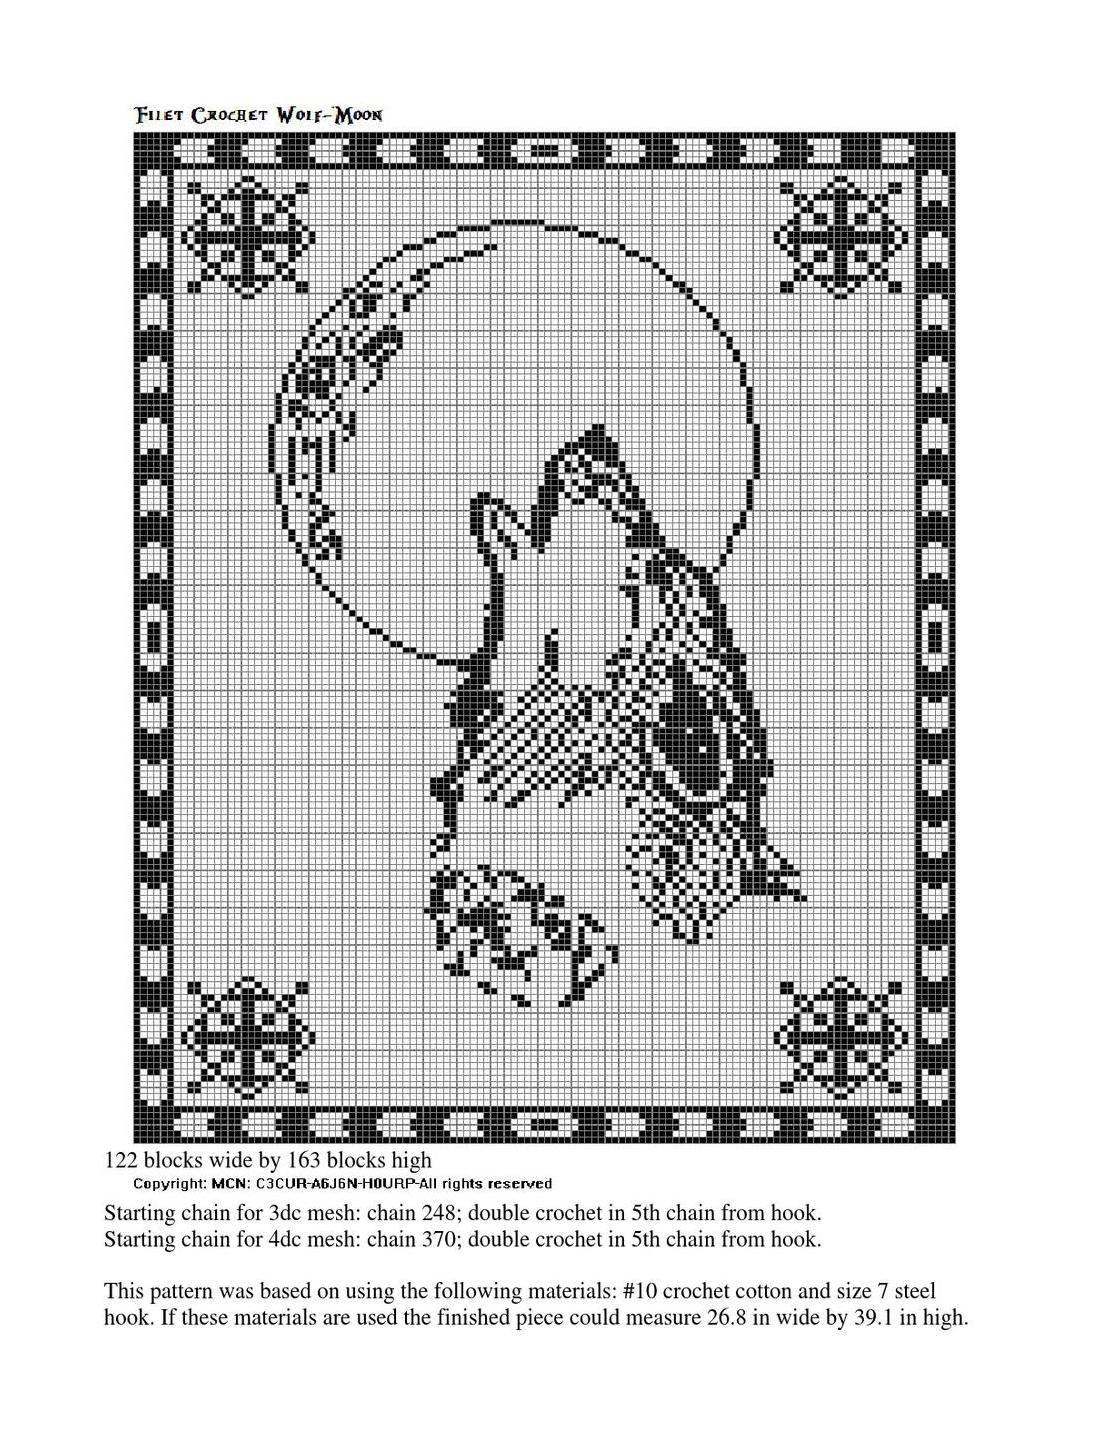 Filet Crochet Western Themes